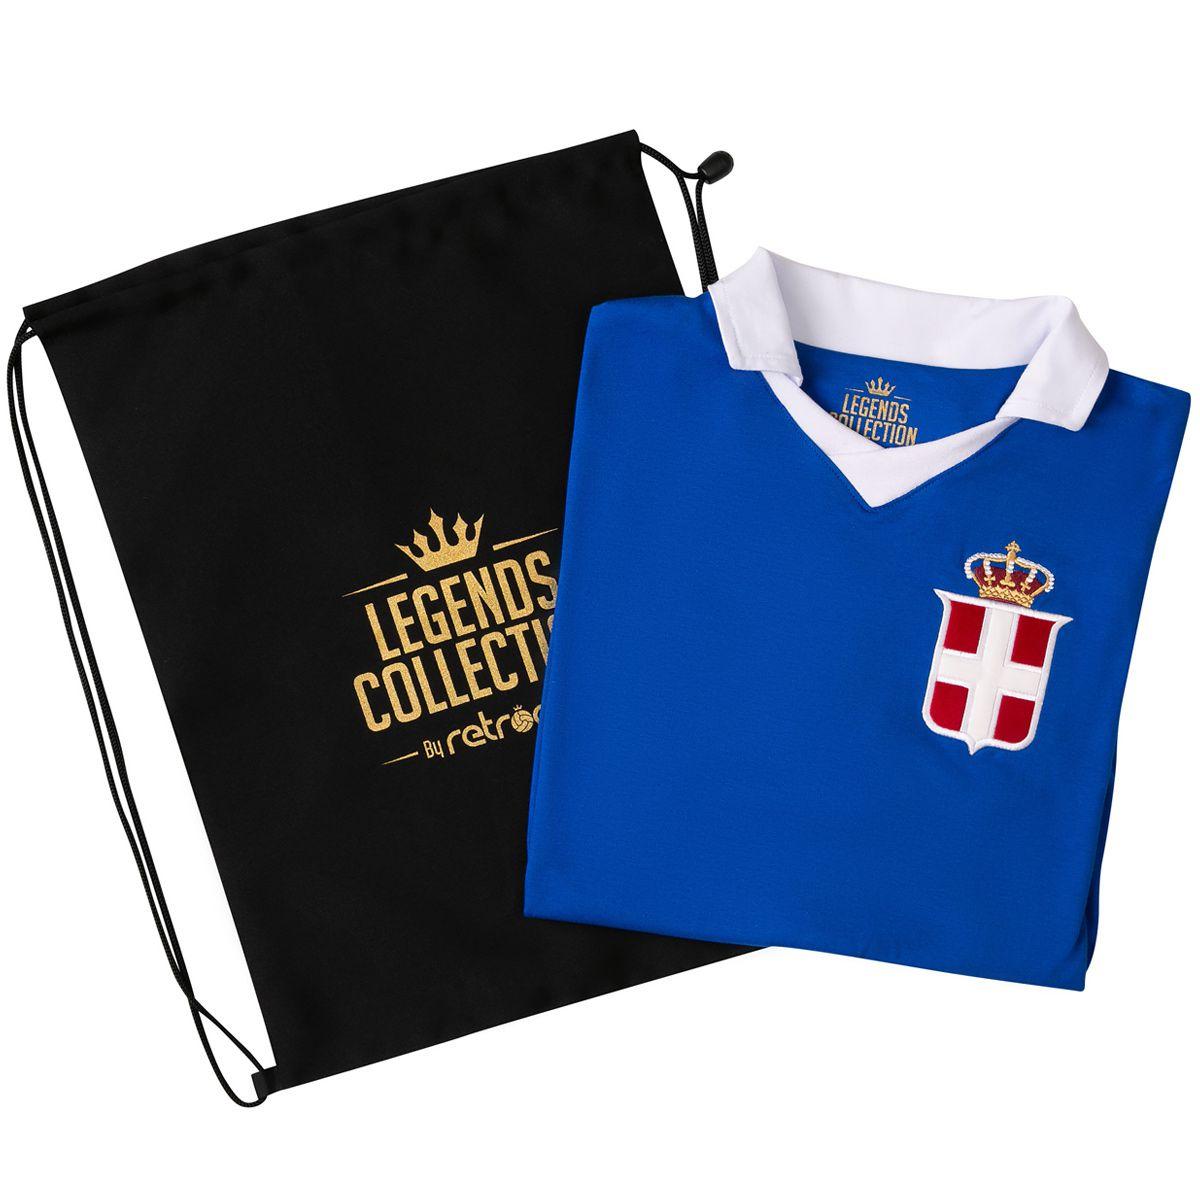 Camisa Itália Retrô Legends Collection + Sacola